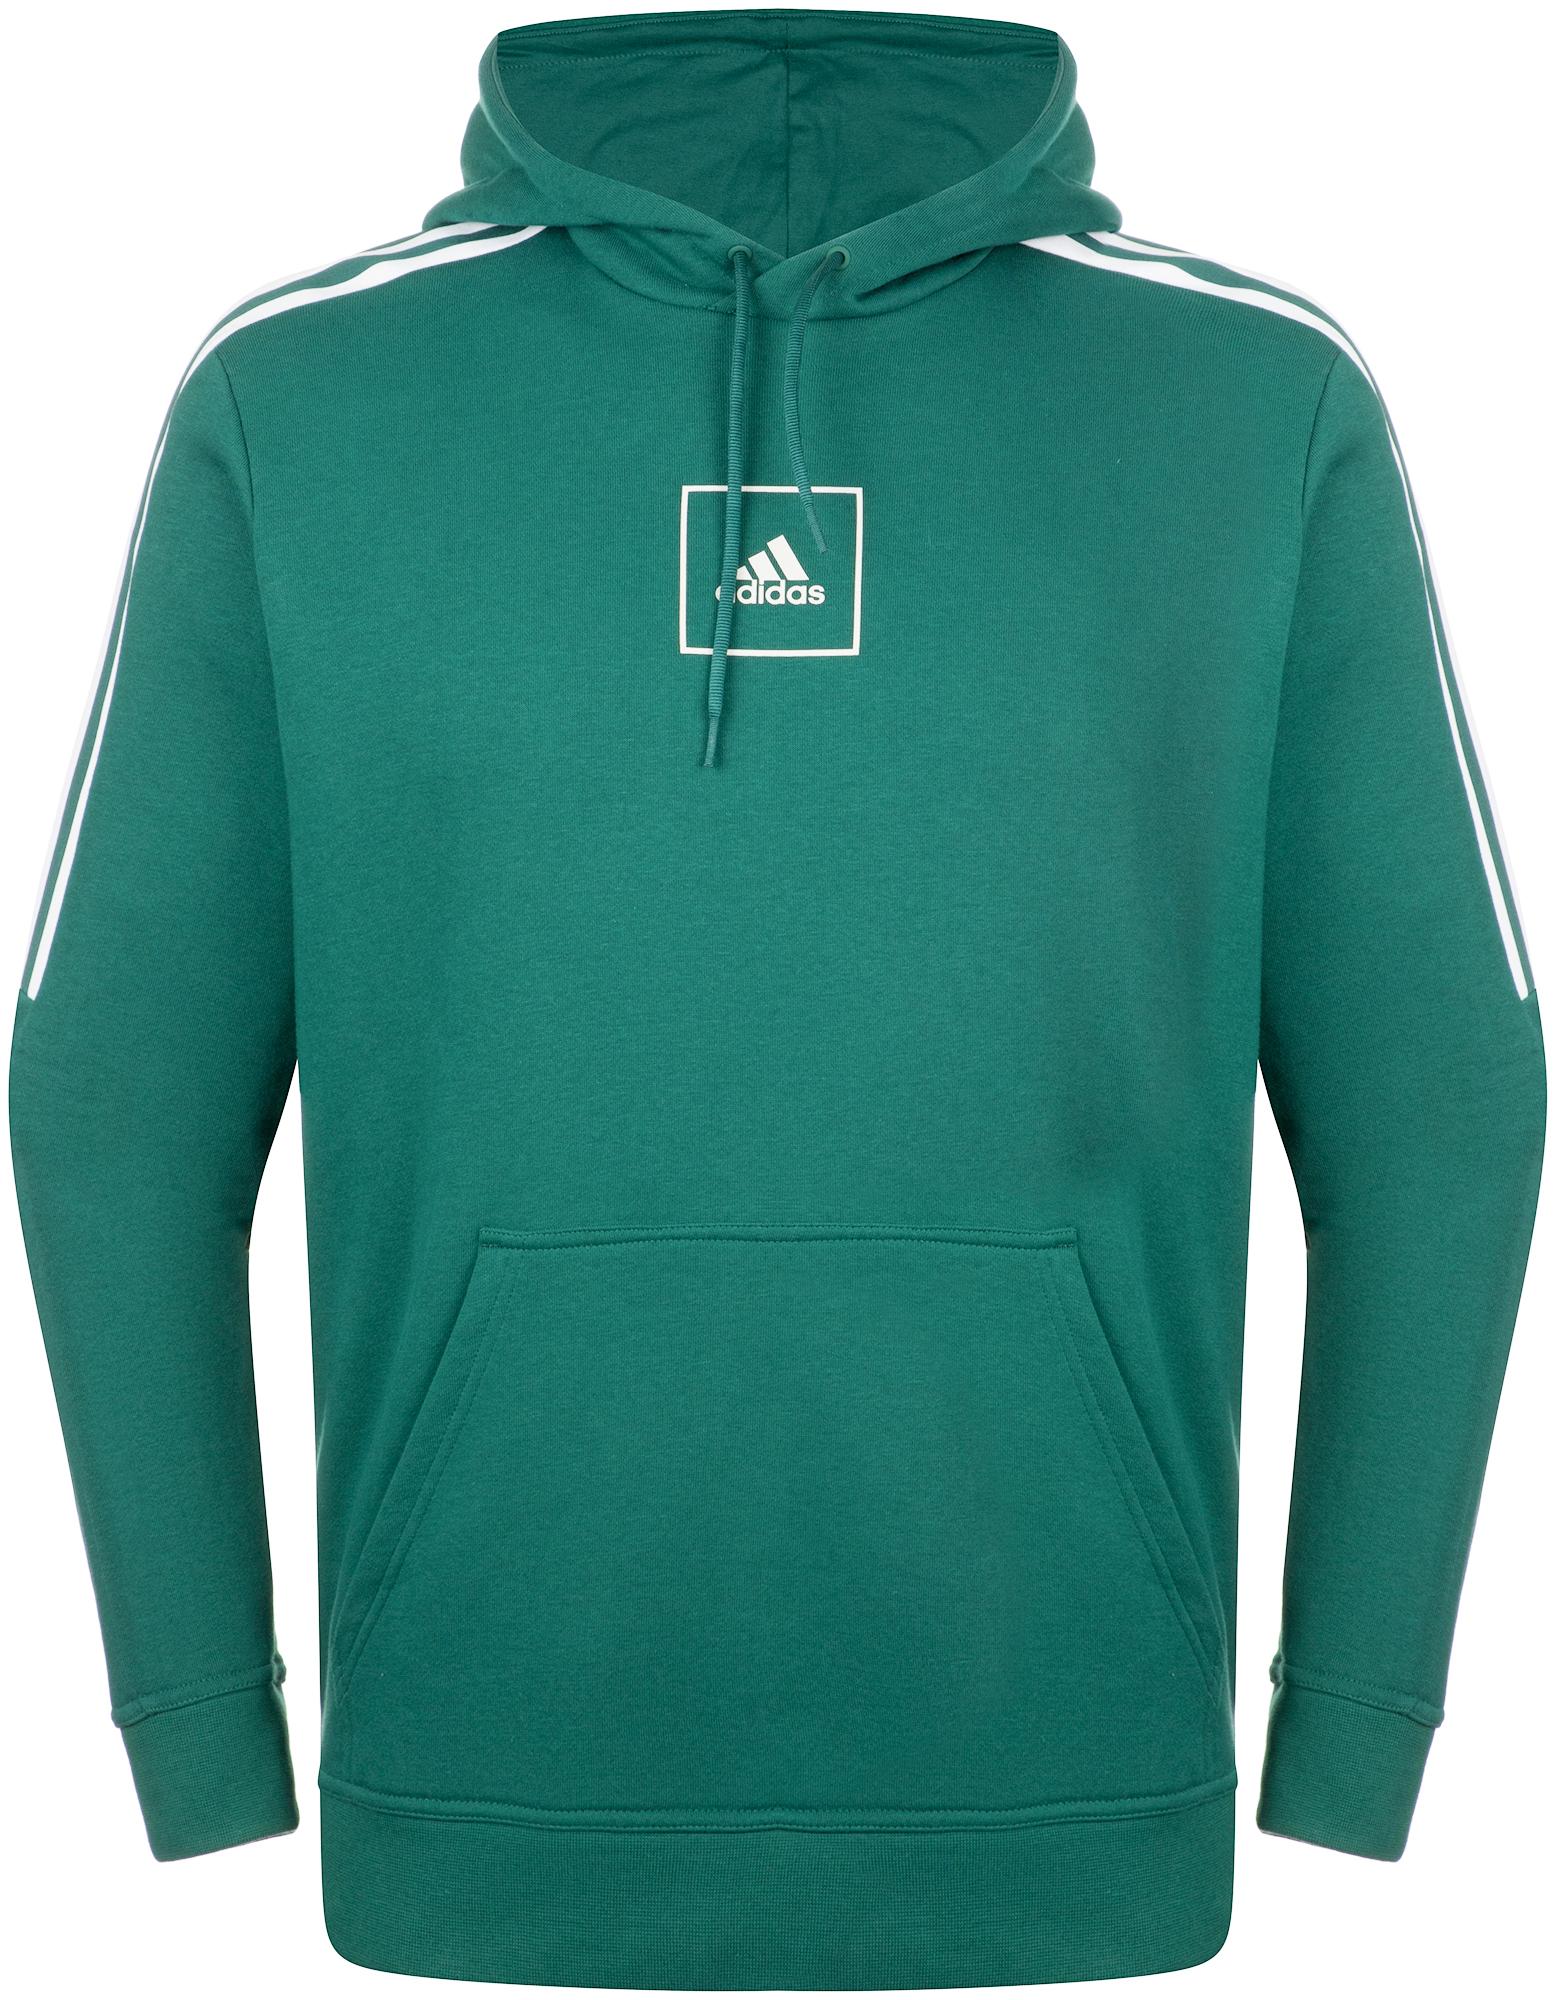 Adidas Худи мужская adidas 3-Stripes, размер 56-58 худи мужское adidas m zne hd fr цвет серый dp5142 размер m 48 50